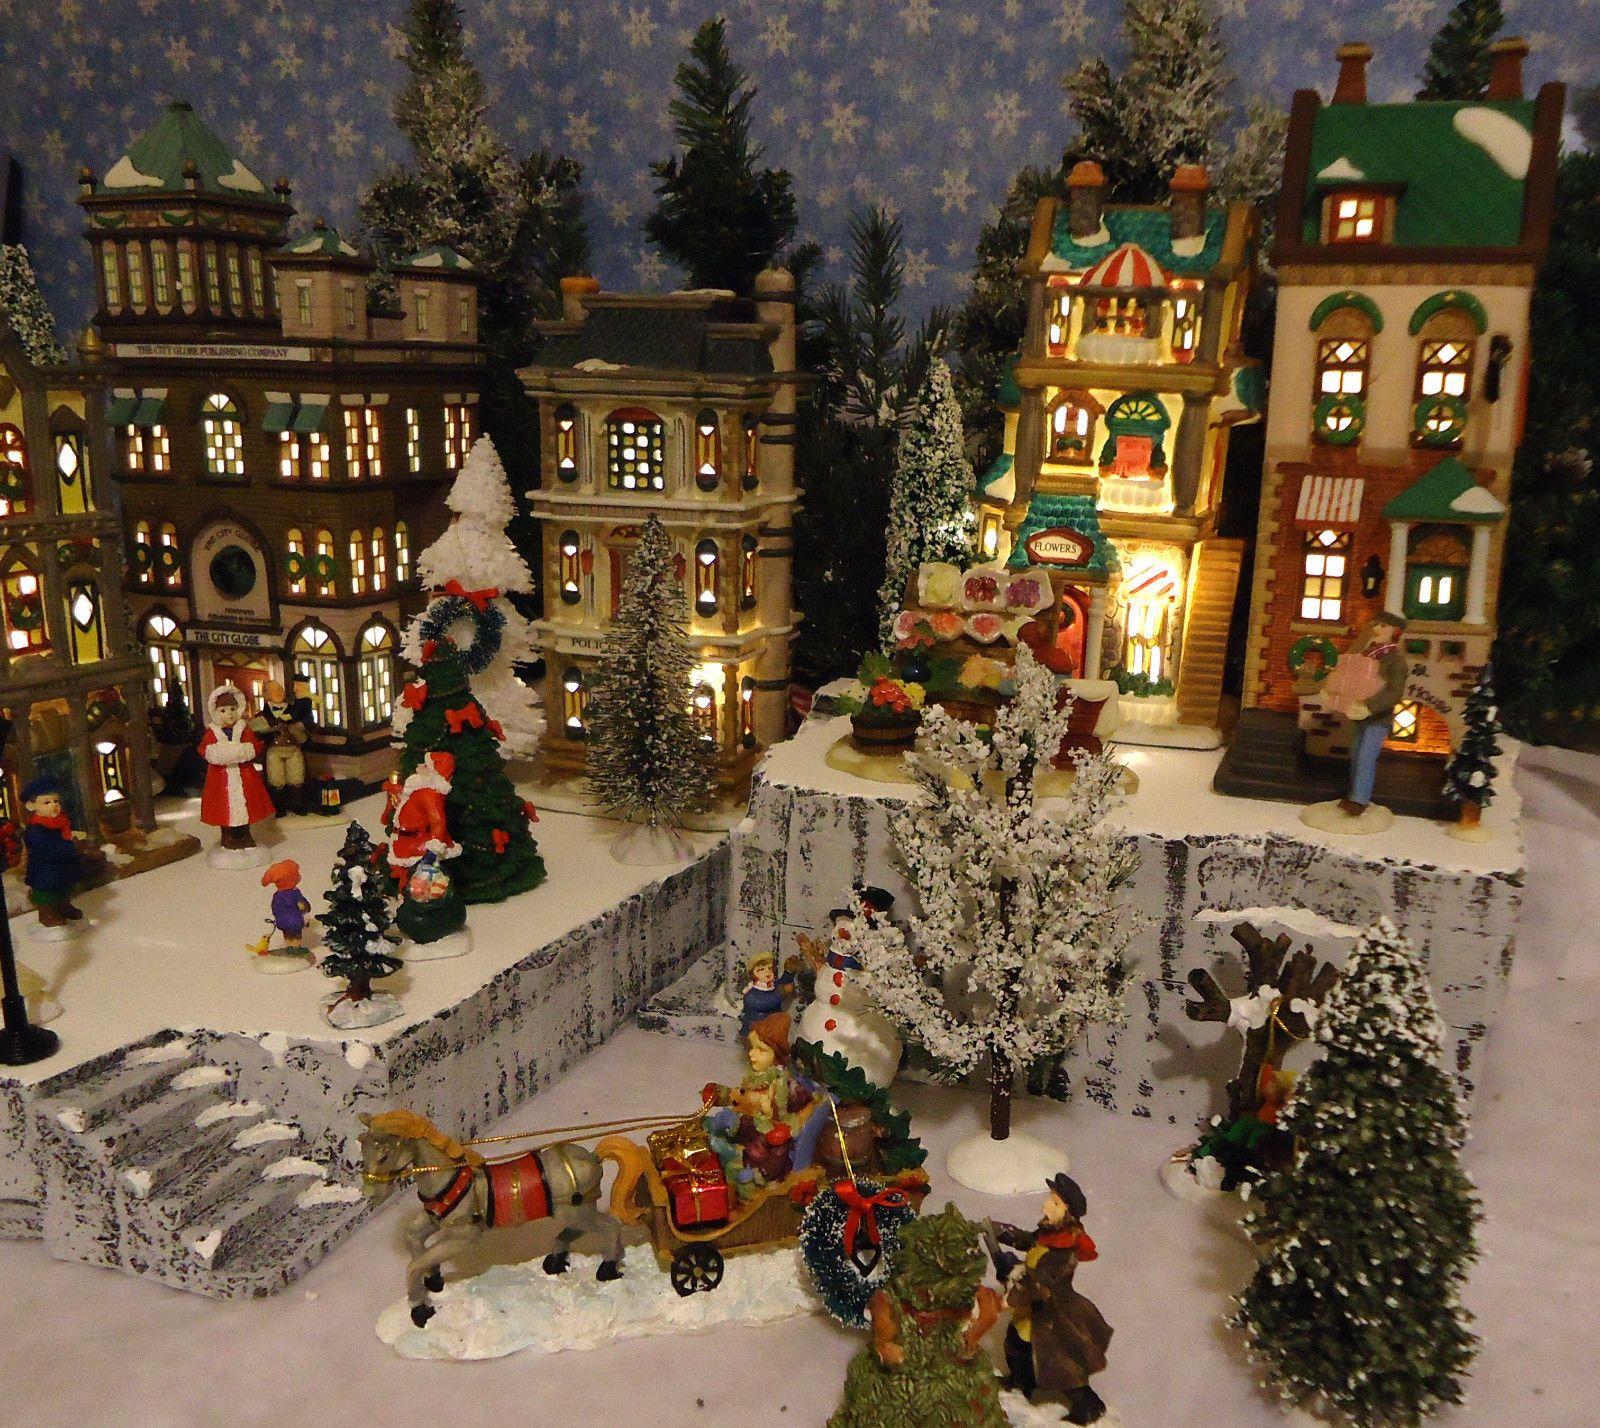 Department 56 dickens village display ideas - Christmas Snow Village Display Platform Base Dept 56 Lemax St Nicholas Square Ebay